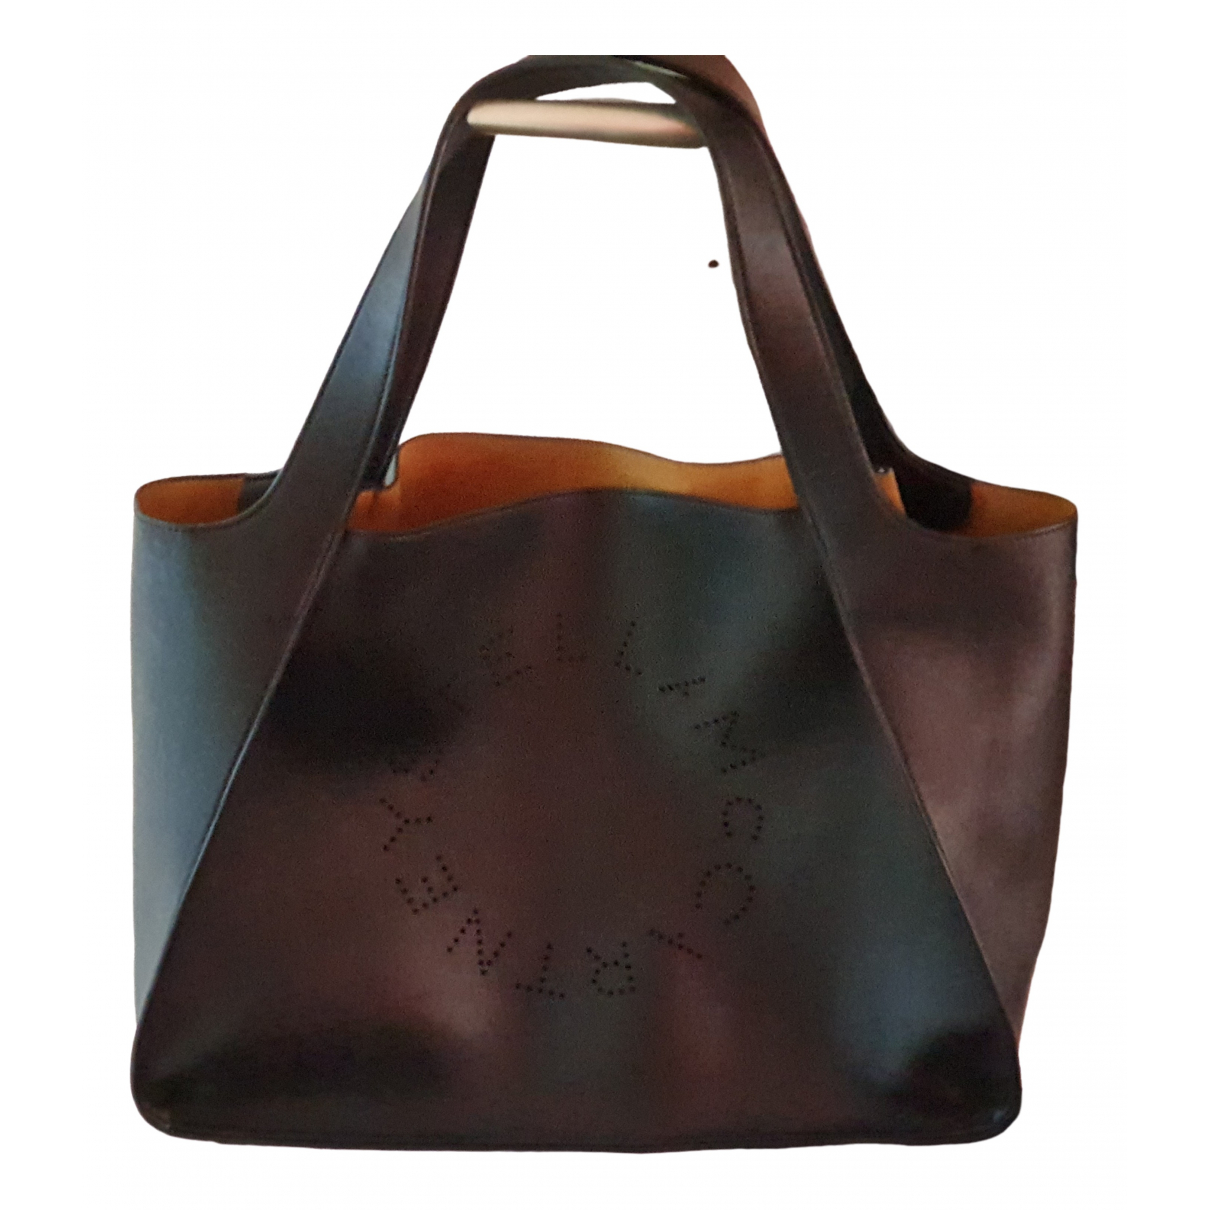 Stella Mccartney \N Black Leather handbag for Women \N